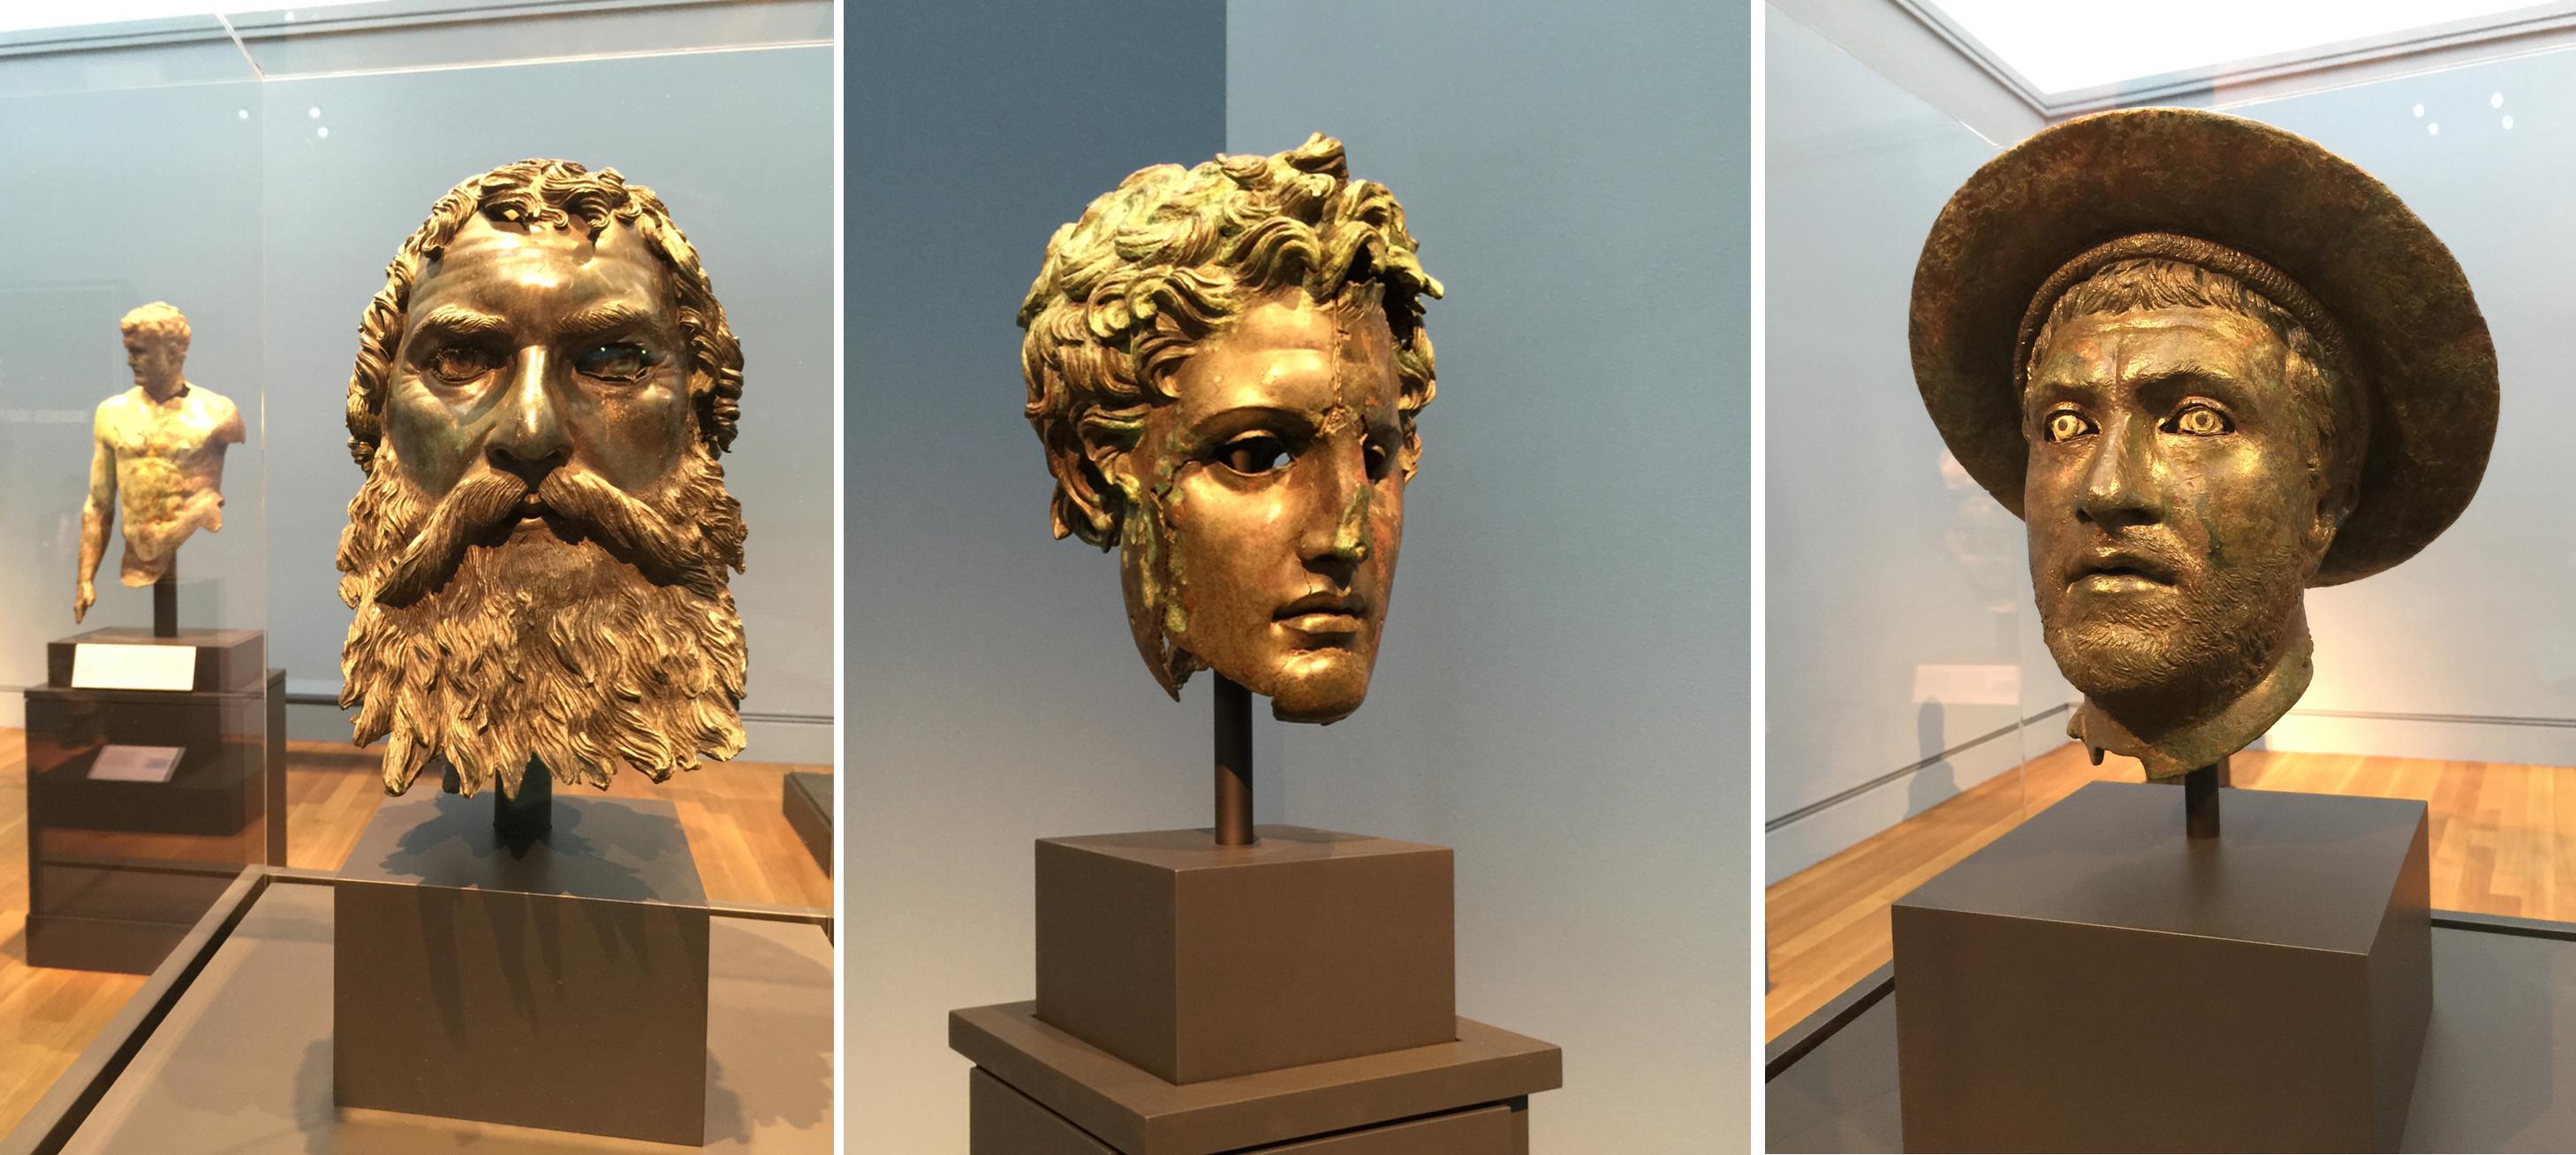 at150728NatlInstArch-Prado-GreekArchMus.jpg